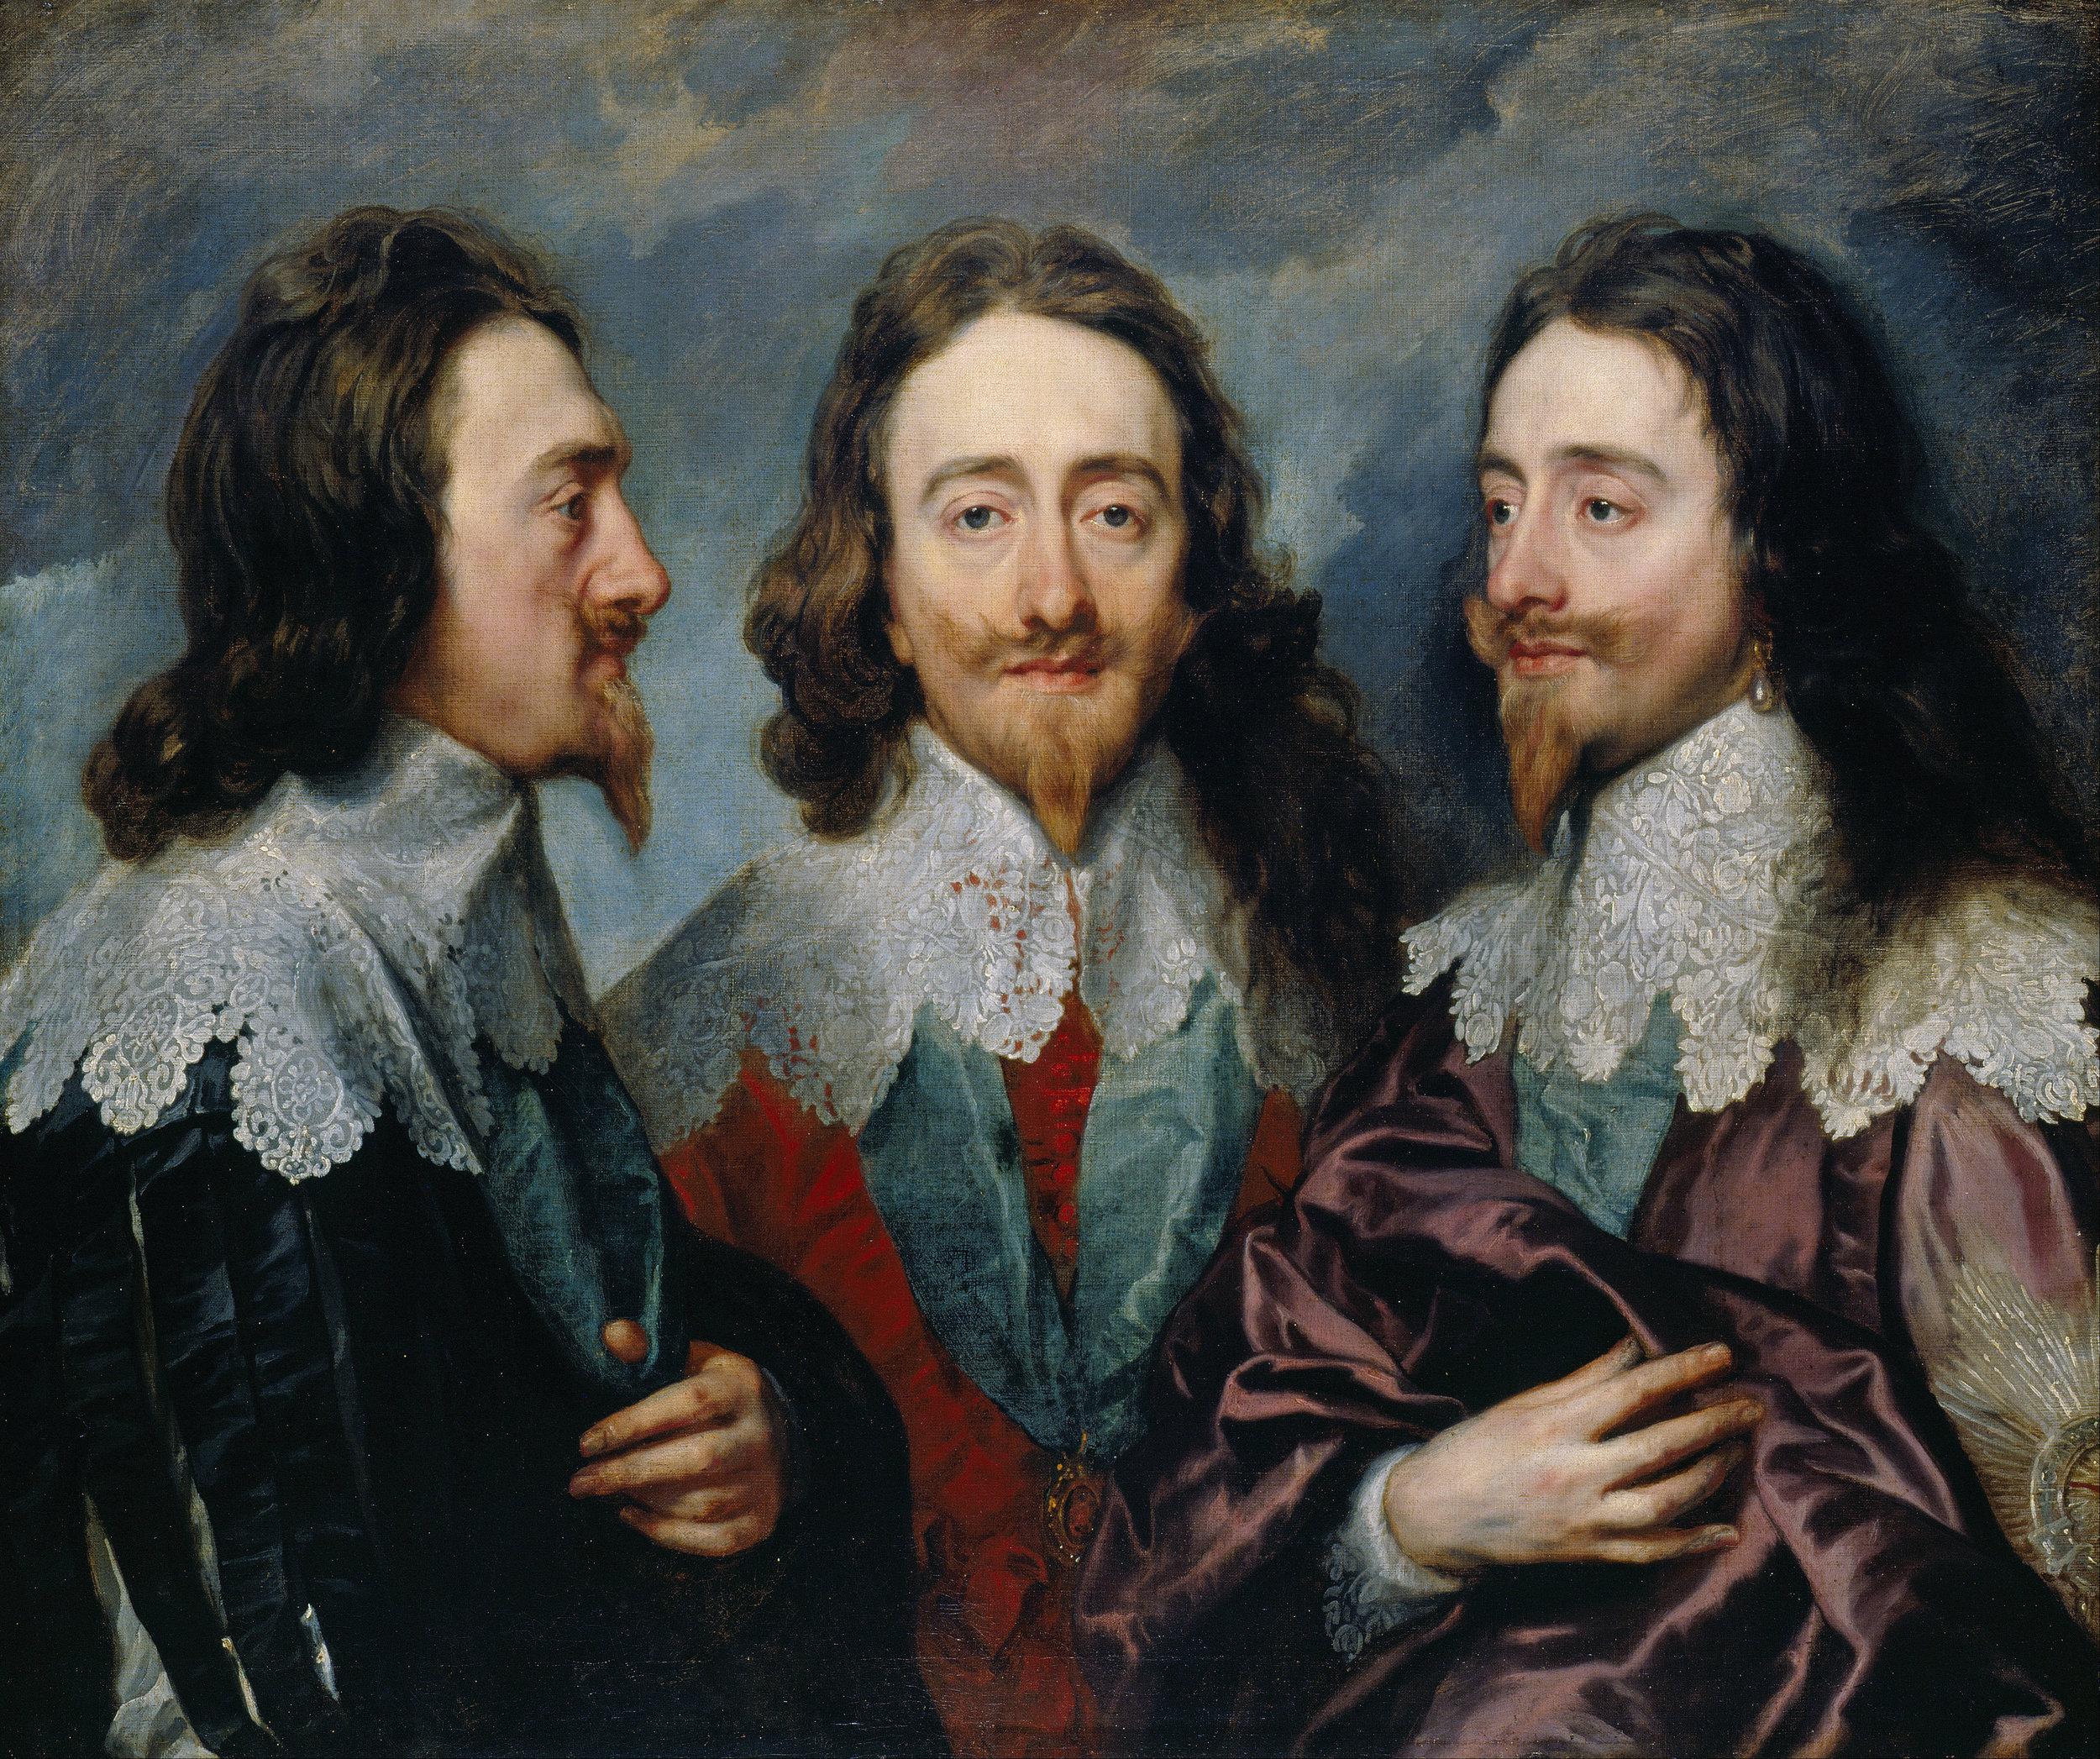 Charles_I_(1600-49).jpg